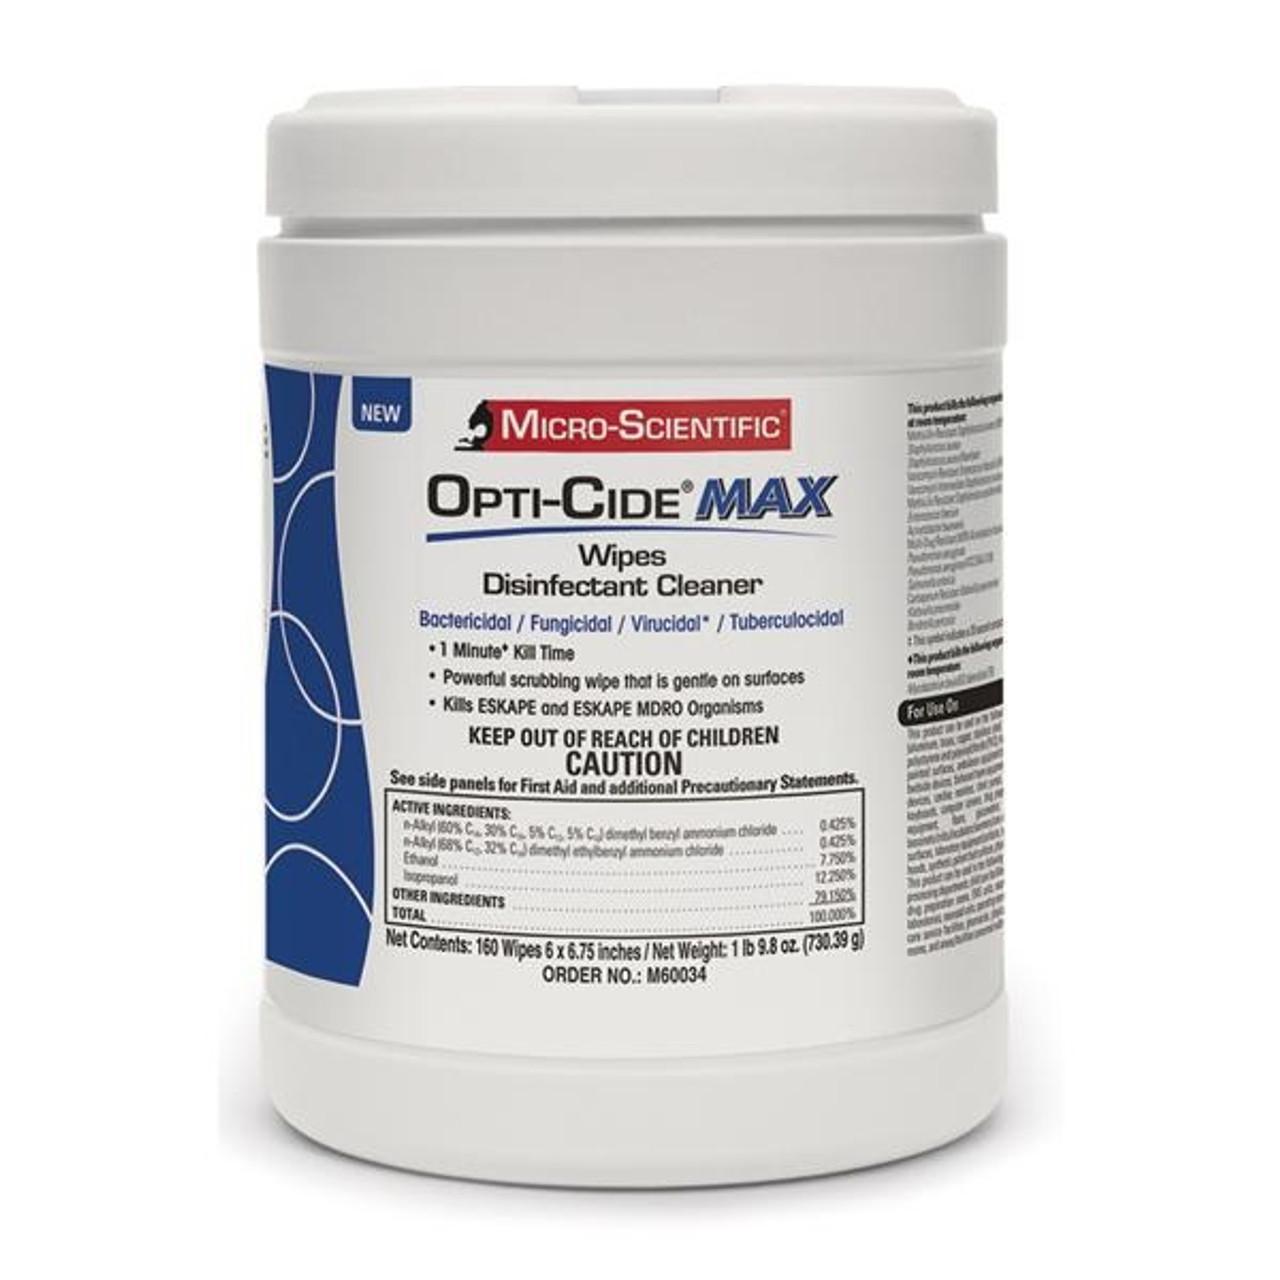 Micro-Scientific Opti-Cide MAX Surface Disinfectant Wipes